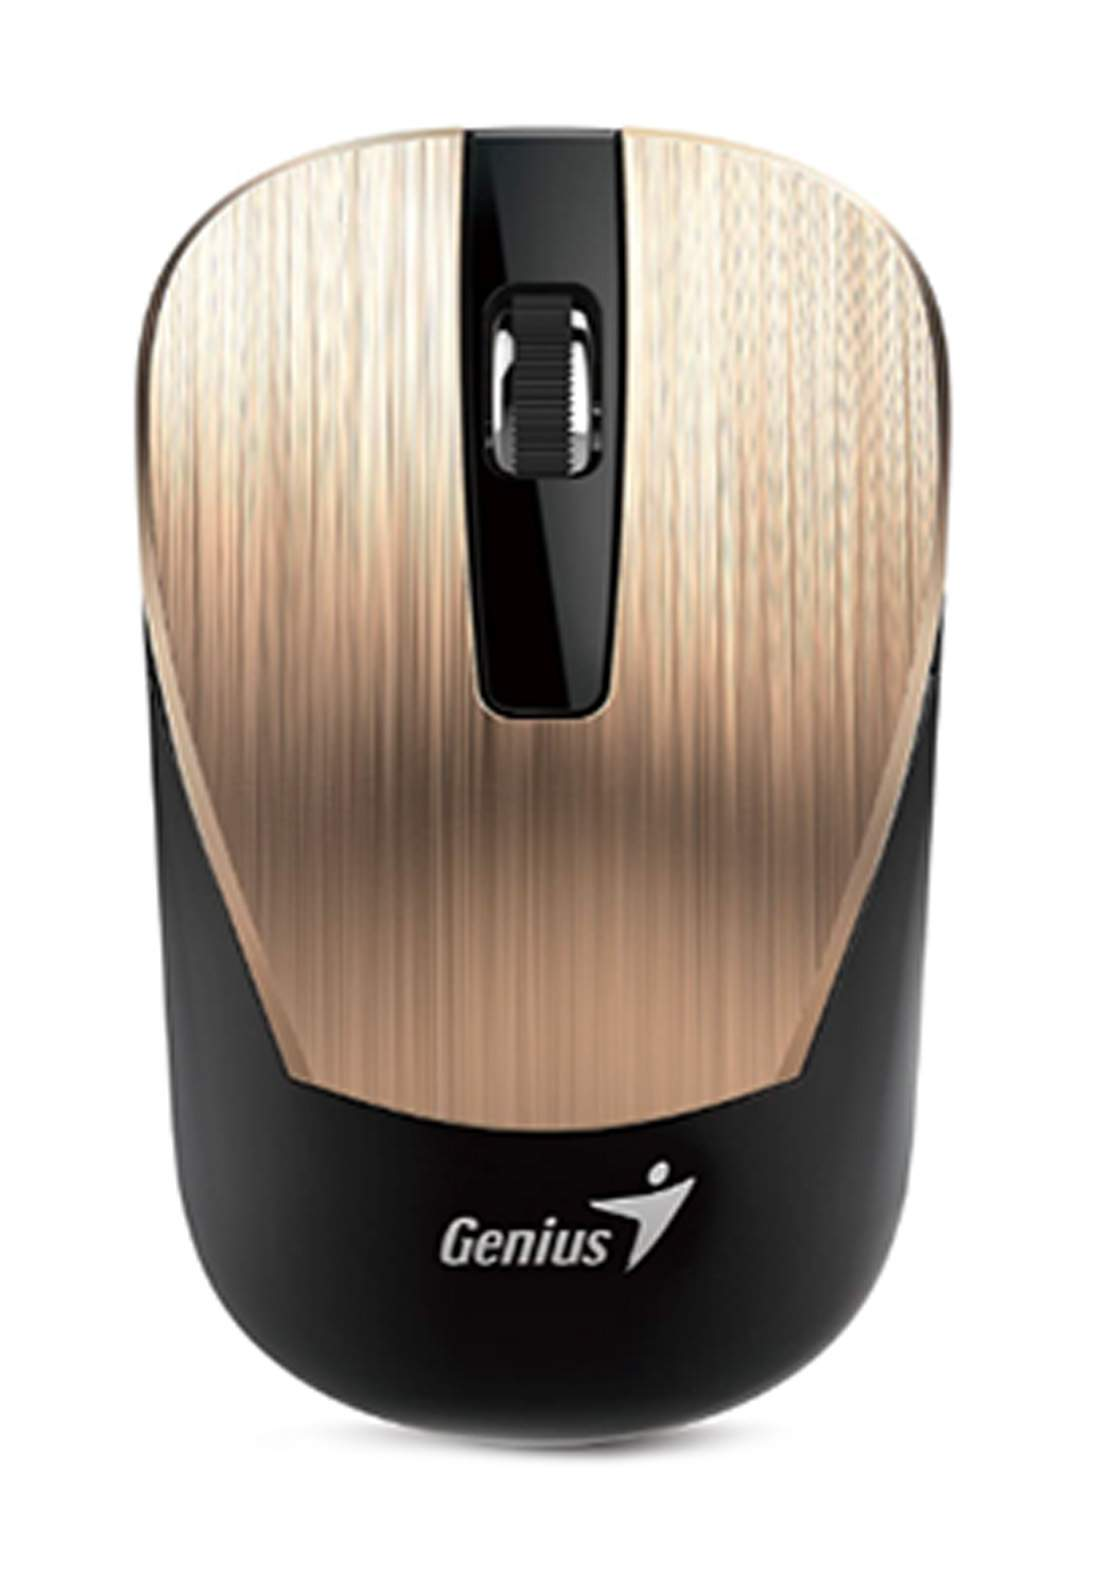 Genius NX-7015 Wireless Mouse ماوس